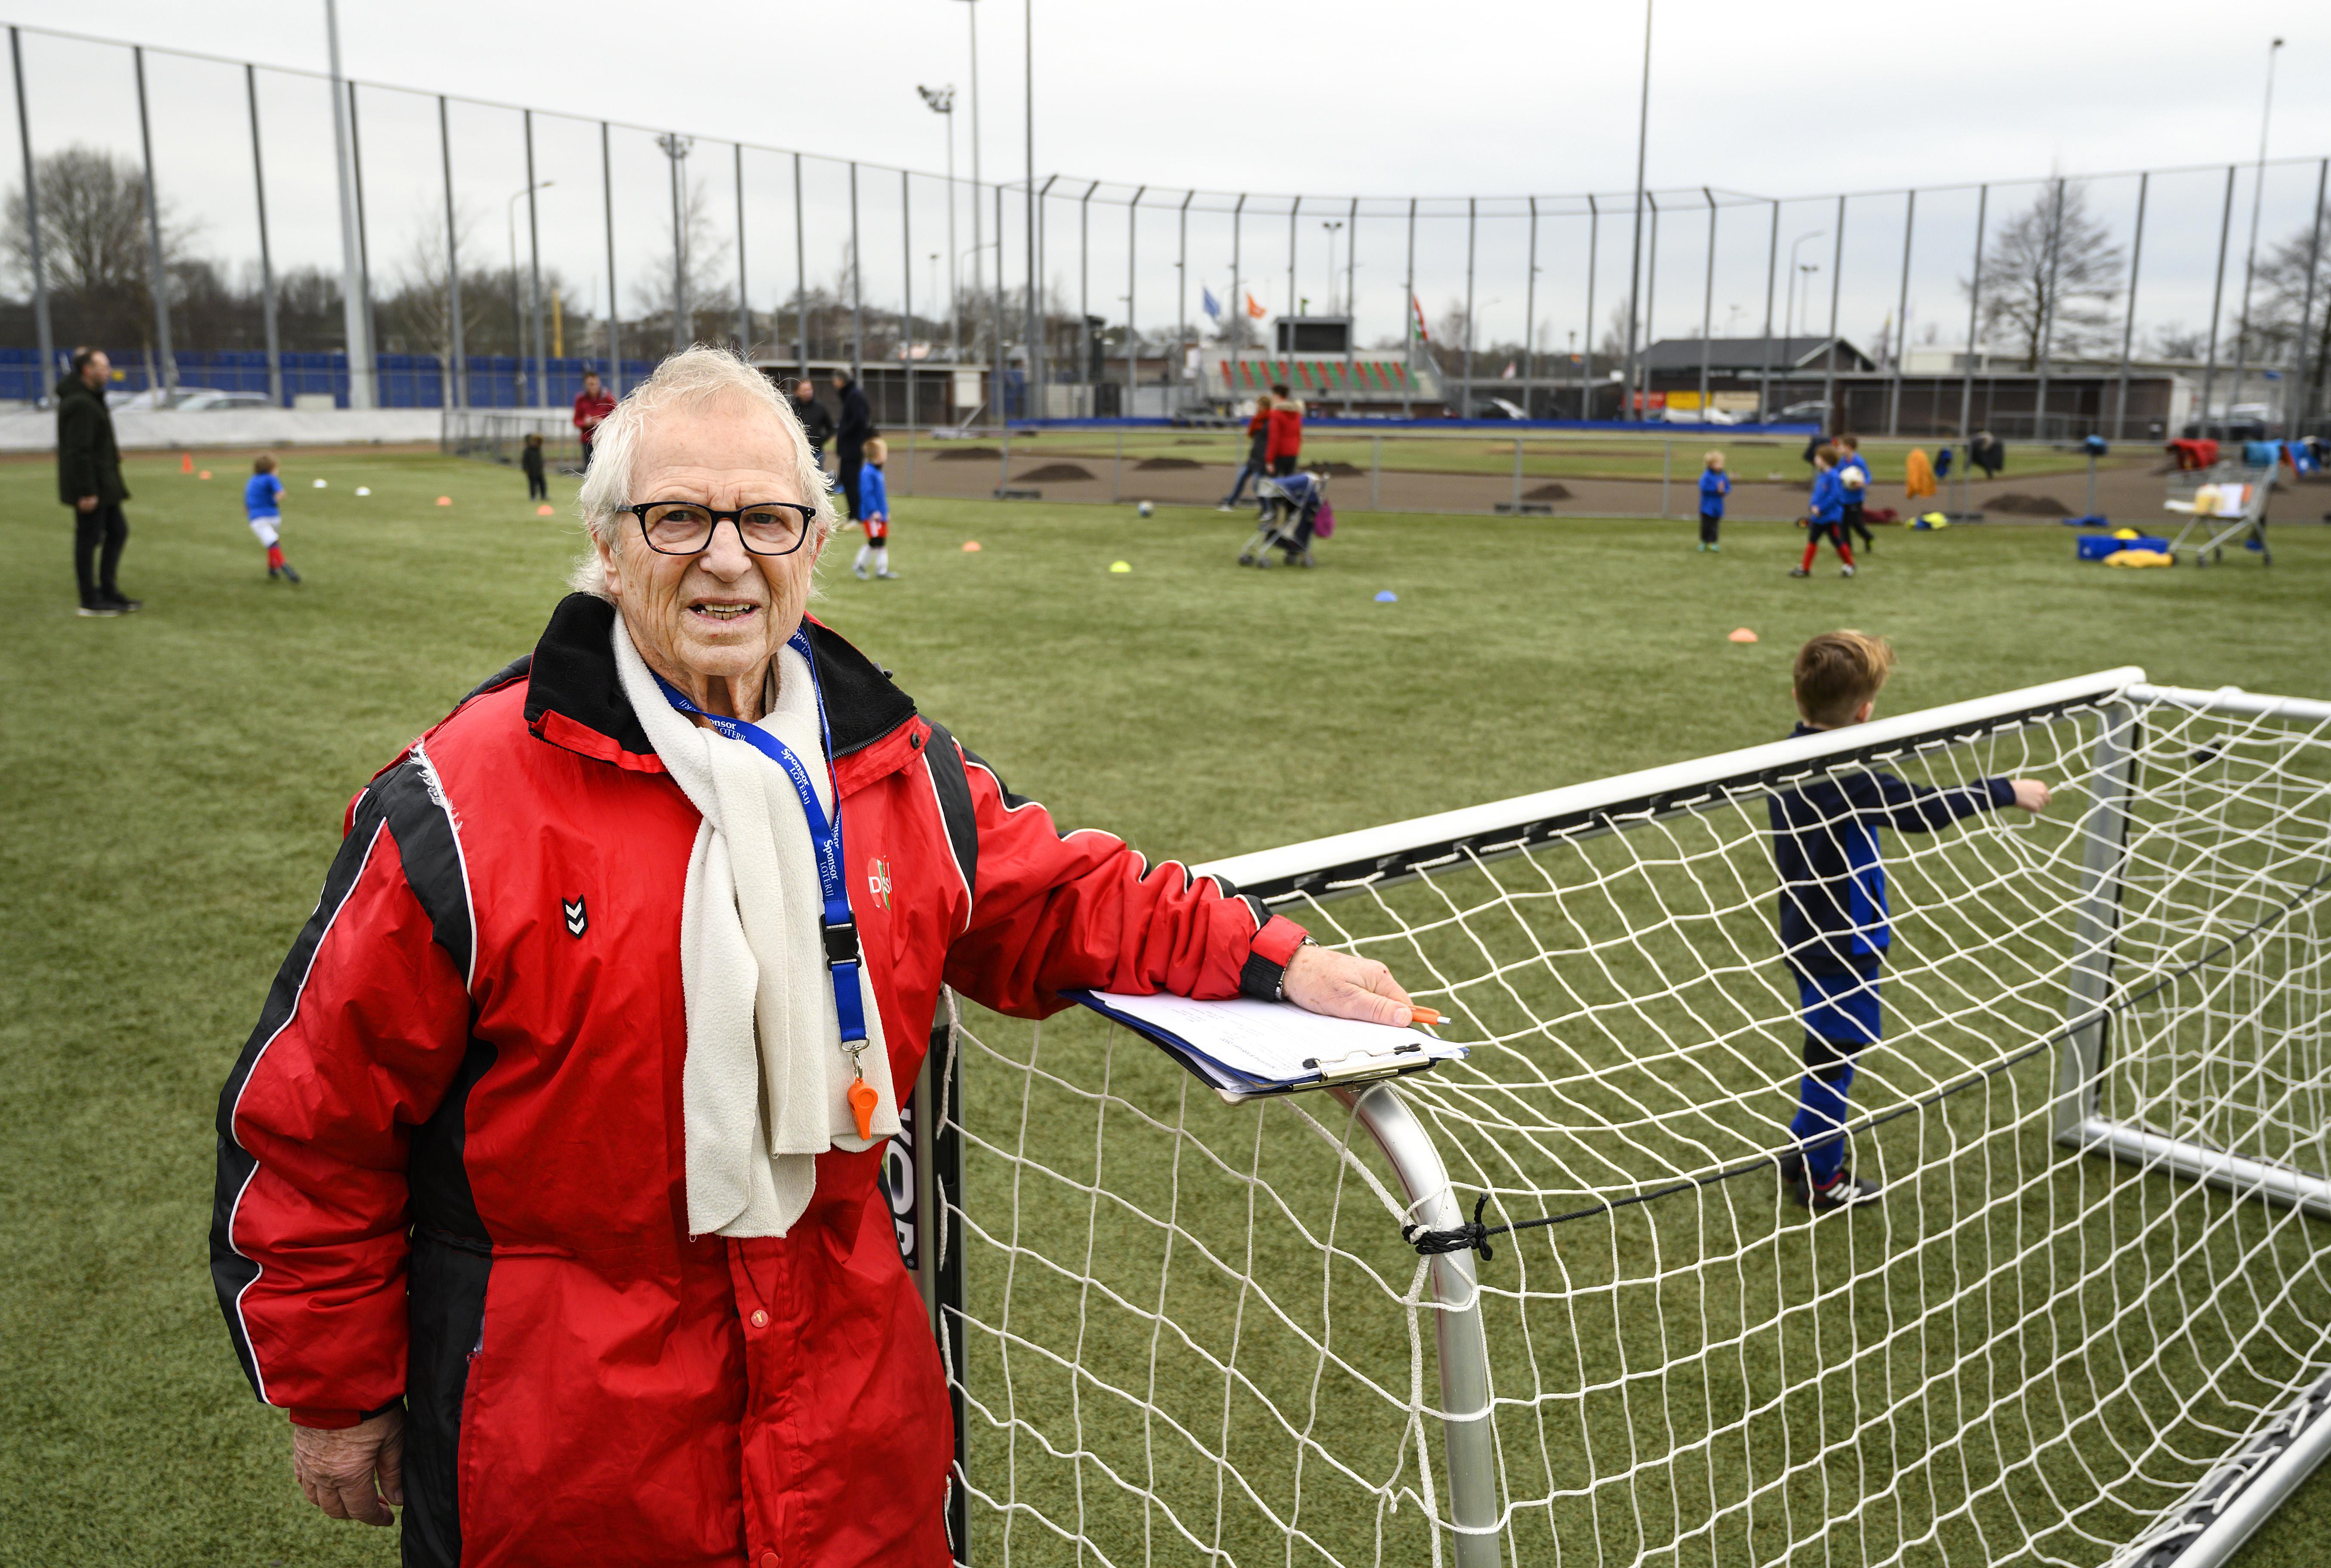 Peter Vink uit Haarlem is 80 jaar oud en al 70 jaar lid van DSS: 'Jonge mensen geven energie'